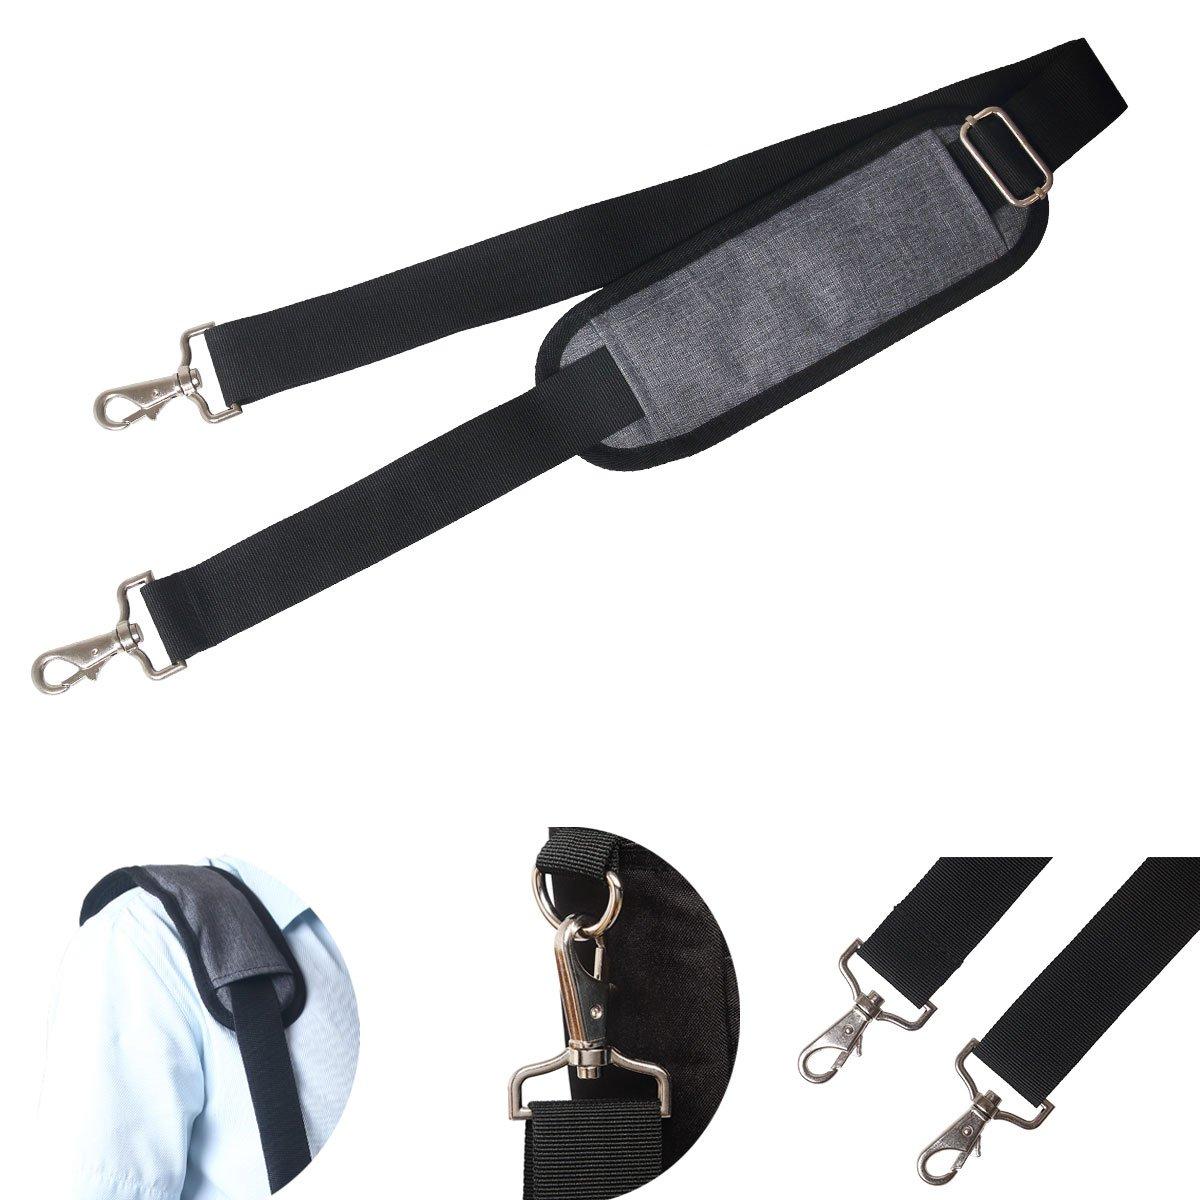 JAKAGO 150cm Universal Replacement Shoulder Straps Adjustable Bag Straps with Metal Swivel Hooks and Non-Slip Pad for Duffel Bag Laptop Briefcase Violin Bag Camera Travel Bag (Grey)